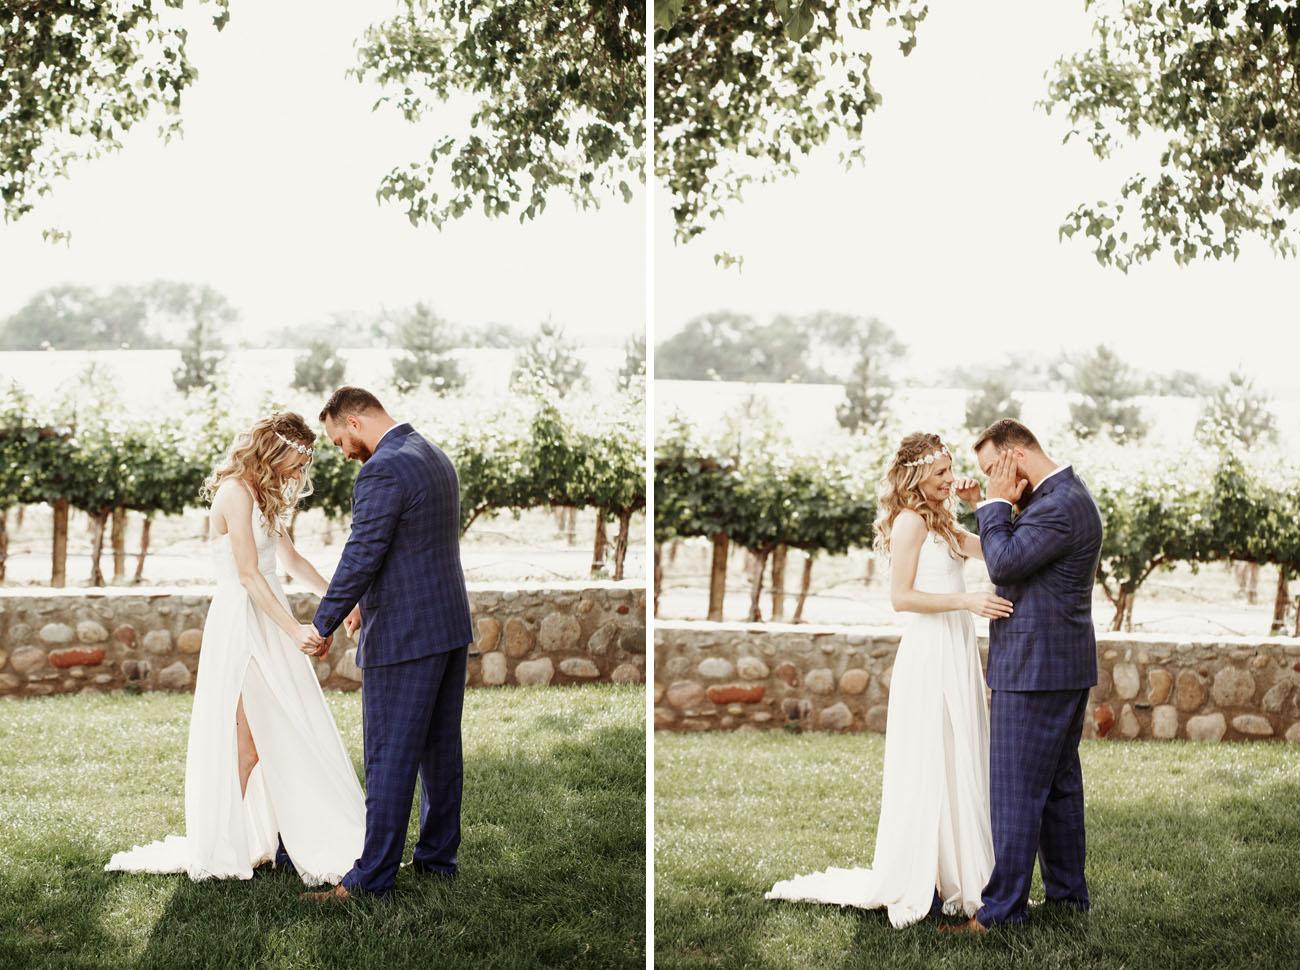 vineyardcolorado-wedding-03.jpg